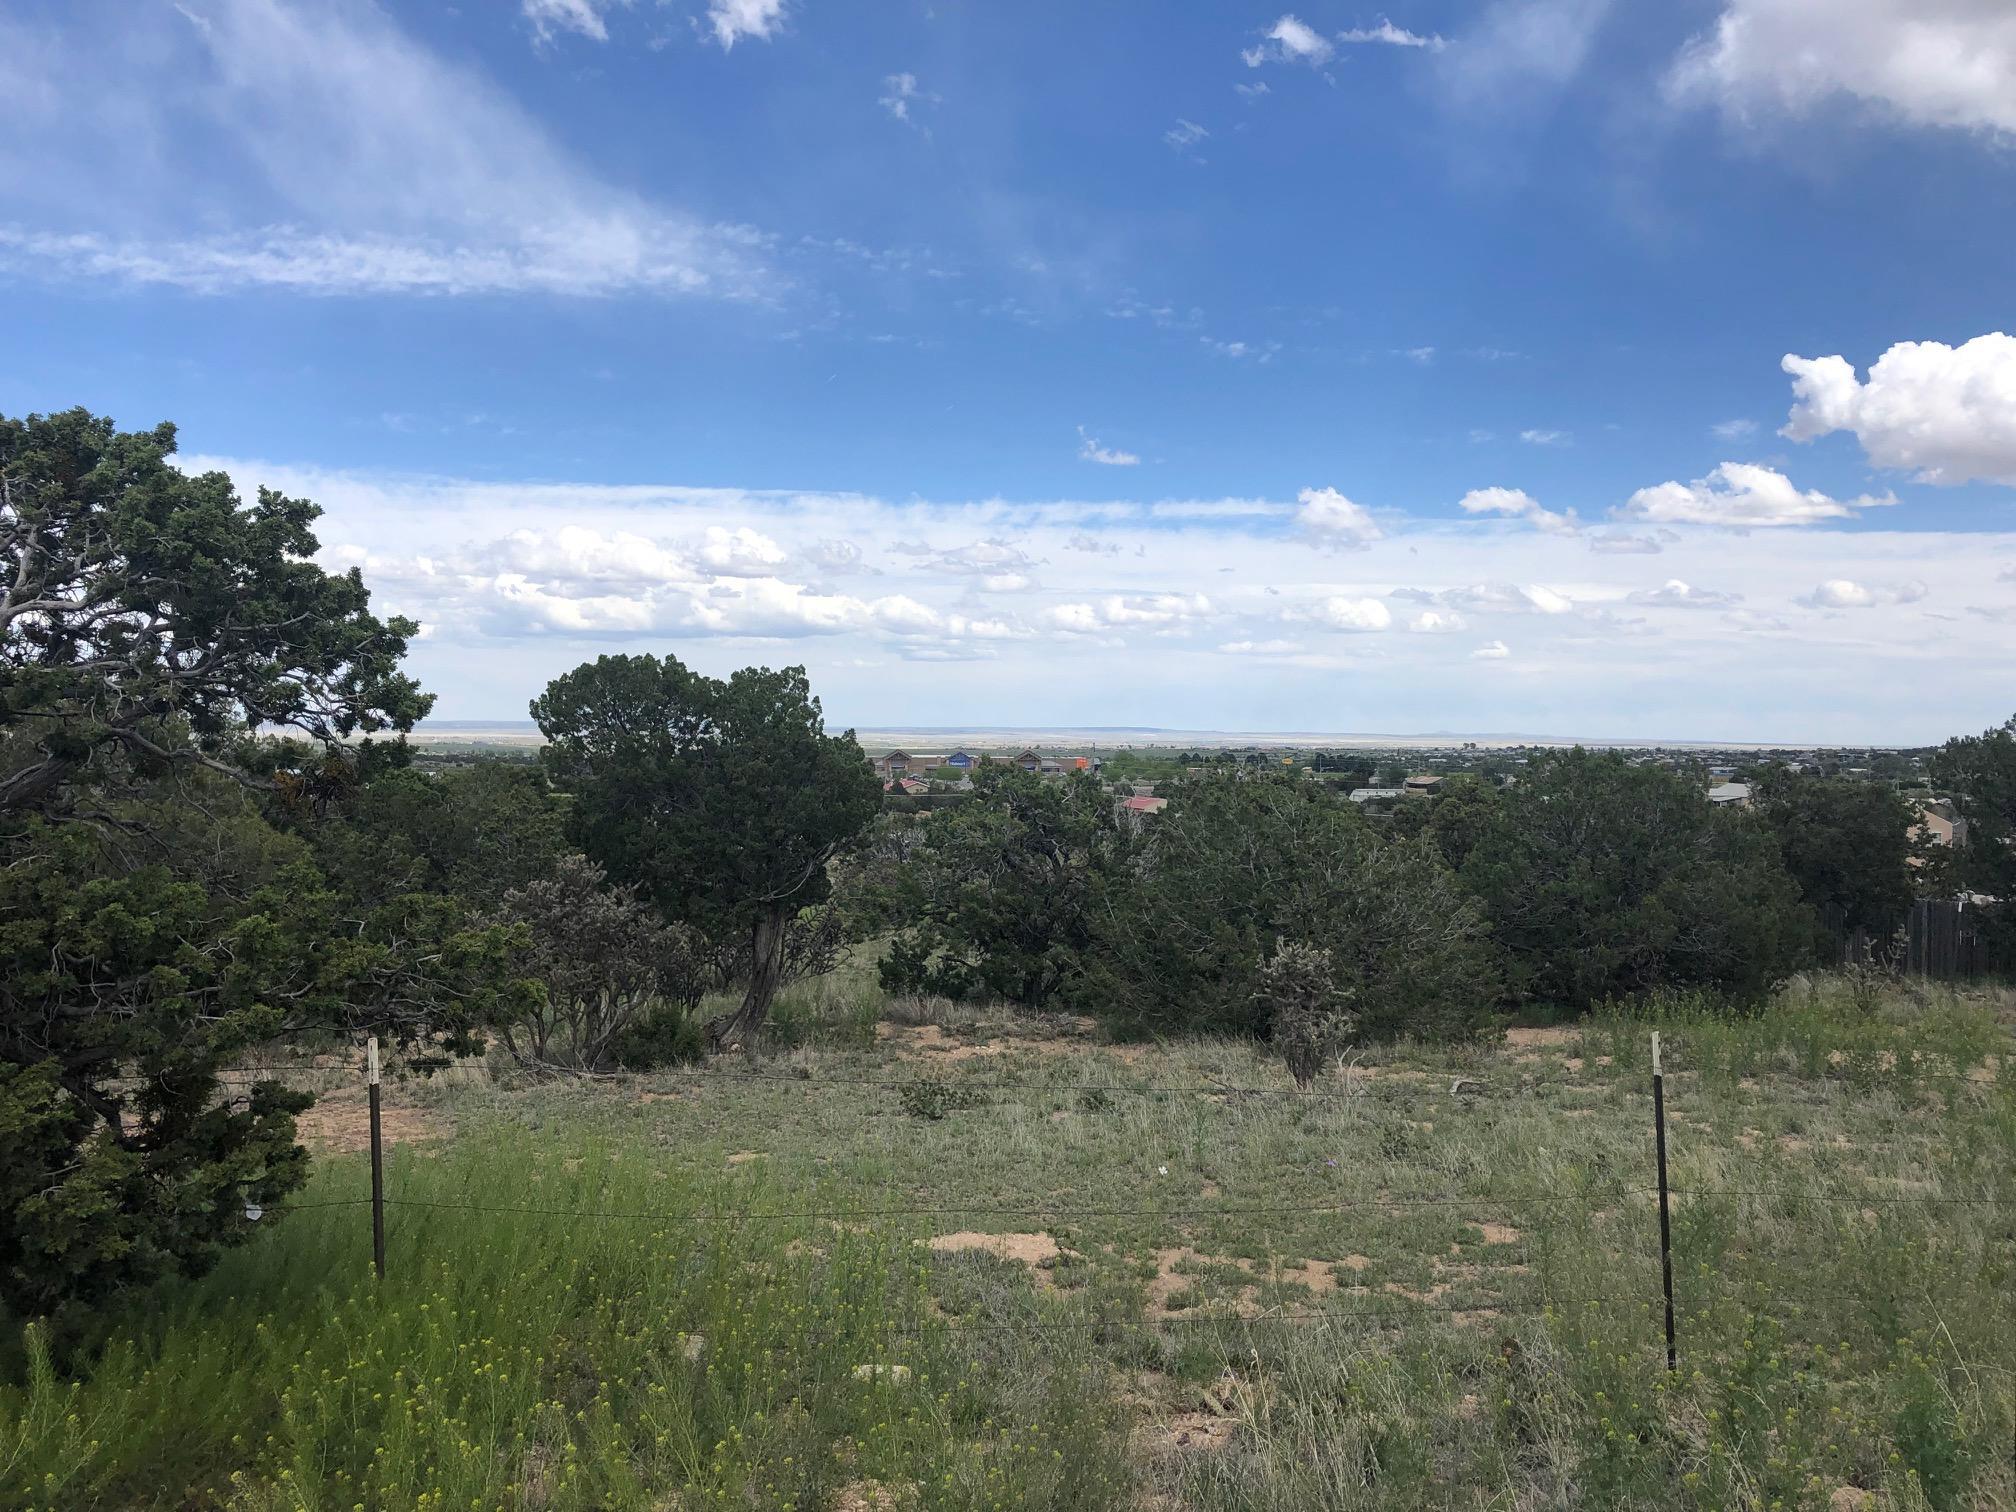 28 Ridgewood Road, Edgewood, New Mexico 87015, ,Lots And Land,For Sale,28 Ridgewood Road,943977